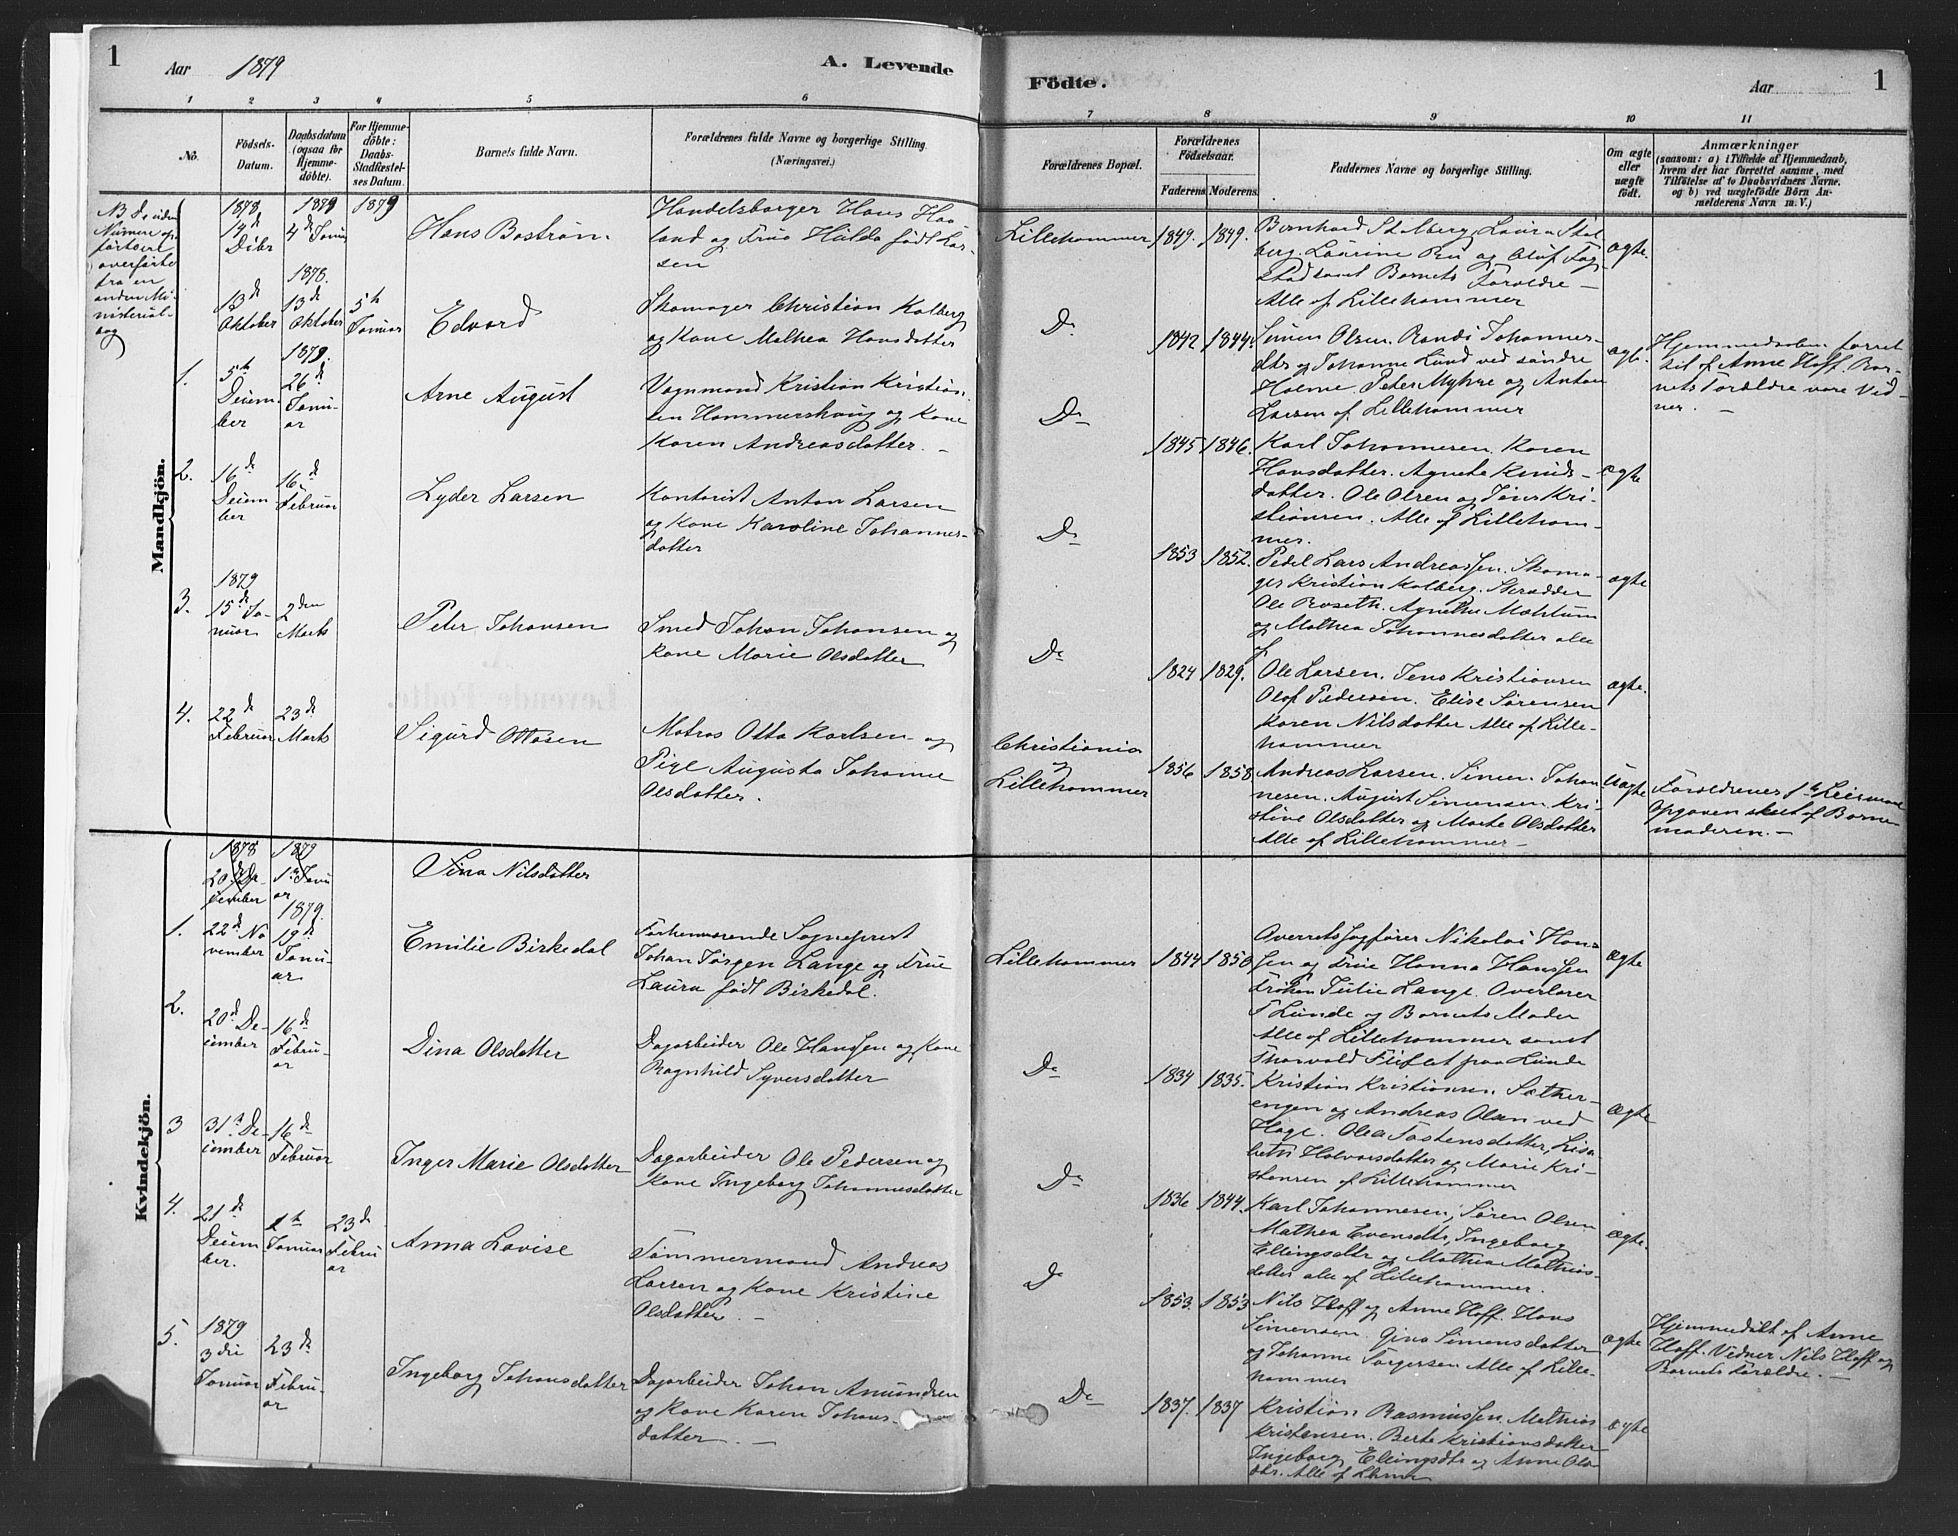 SAH, Fåberg prestekontor, Ministerialbok nr. 10, 1879-1900, s. 1